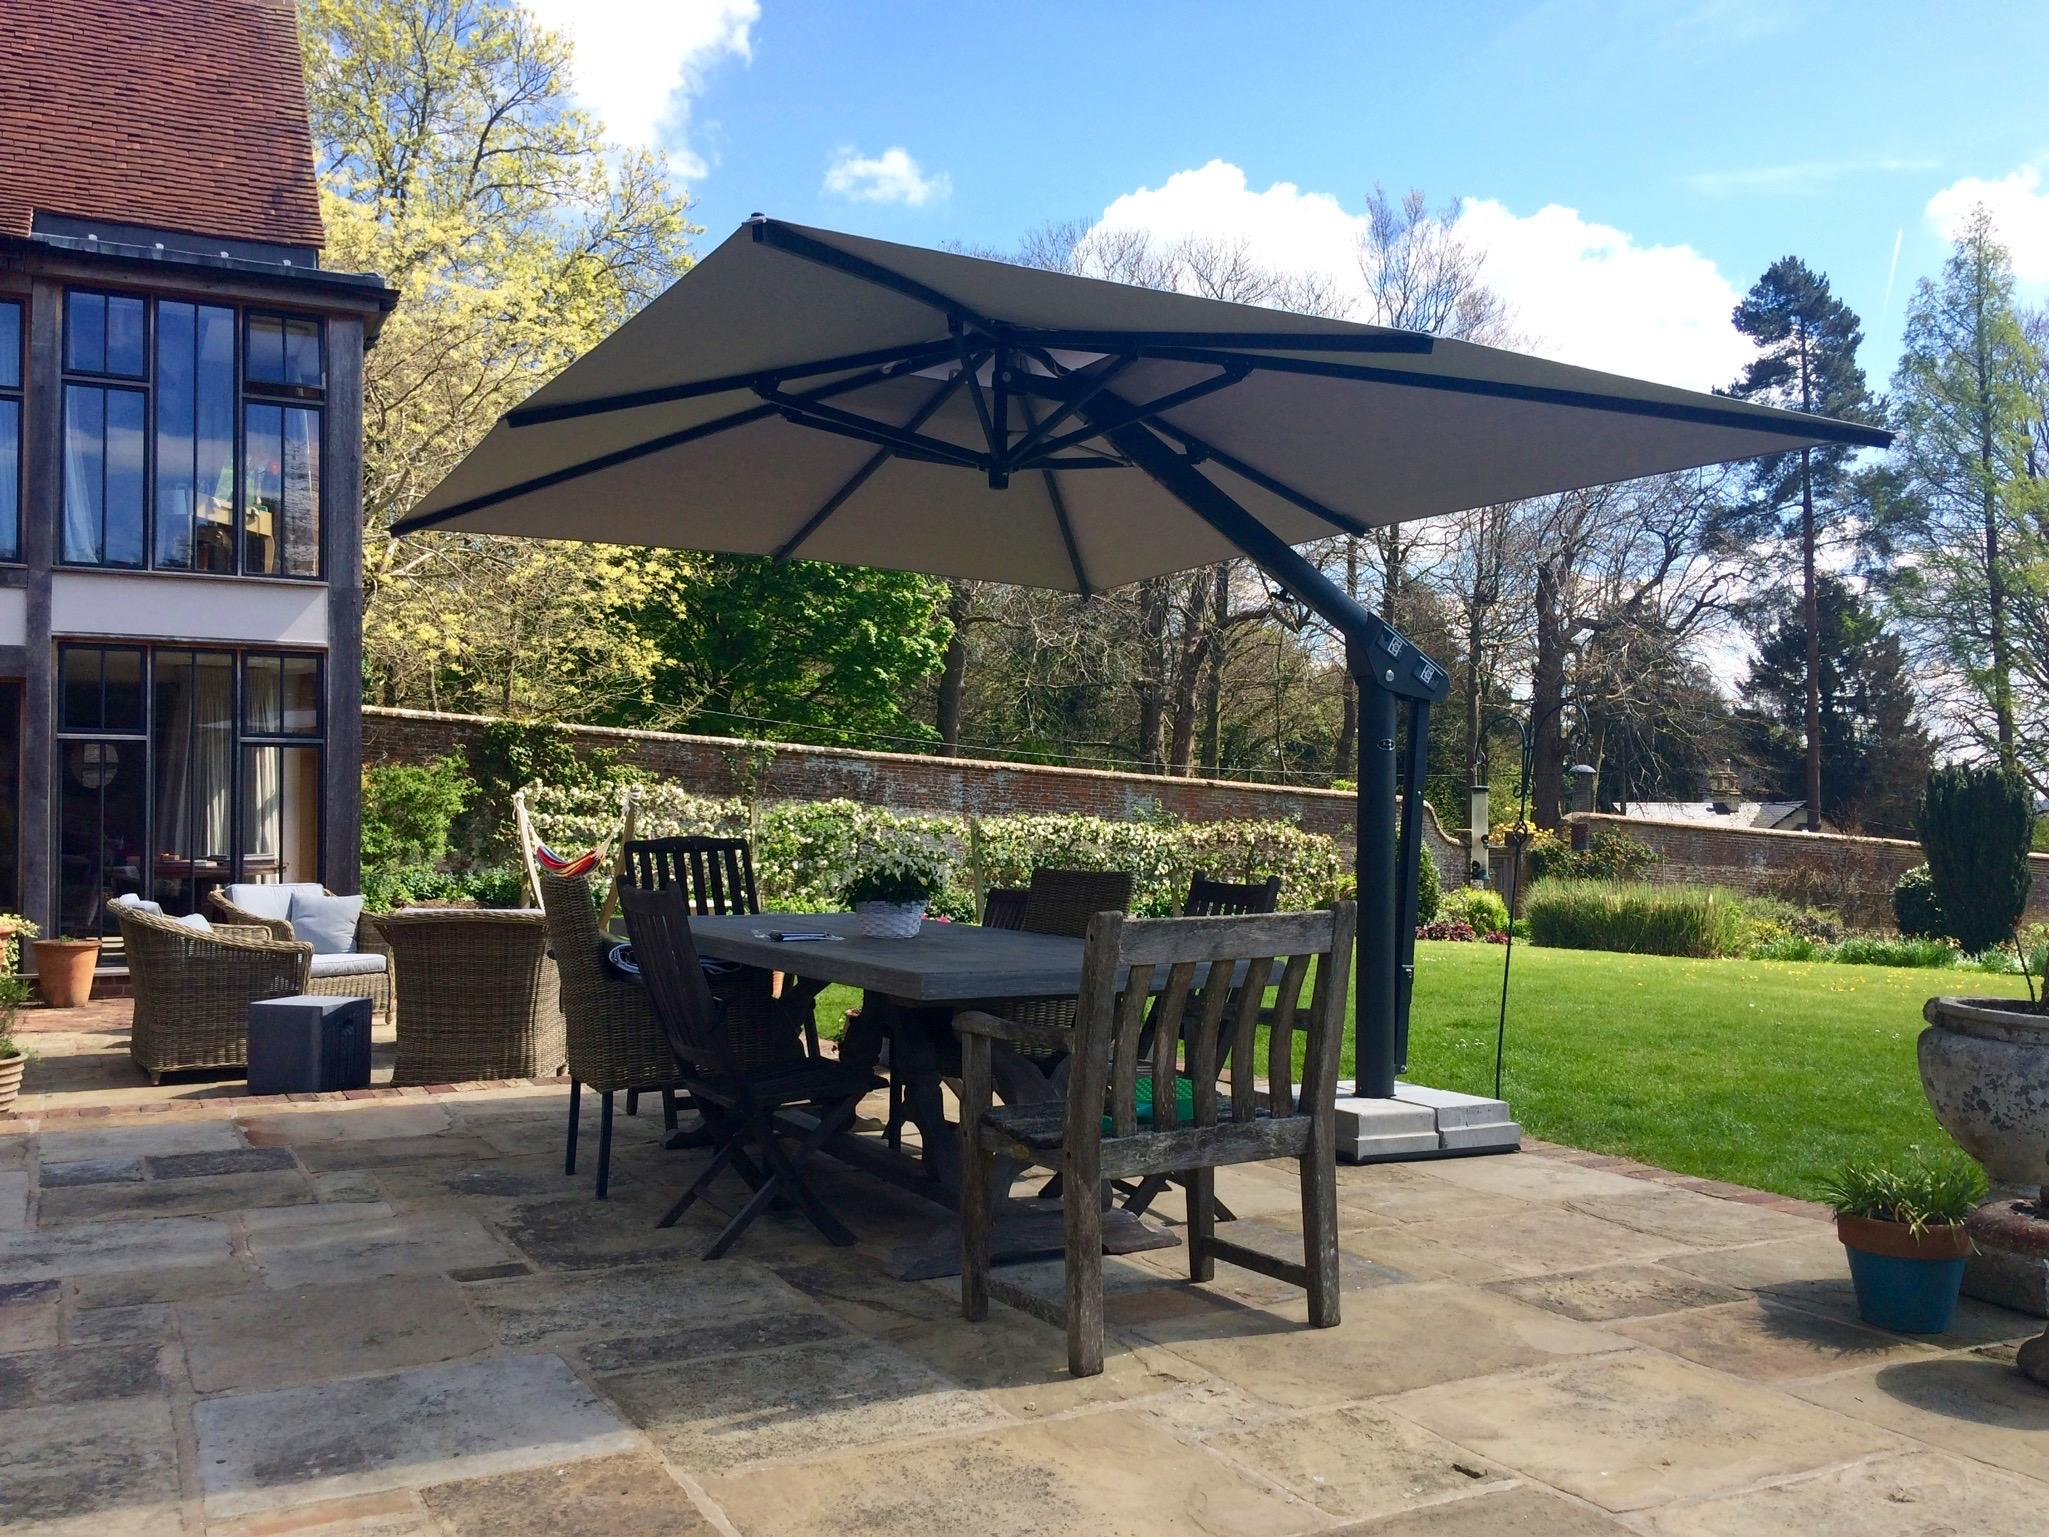 de8da87891 Large Garden Umbrellas & Parasols - Kent & Surrey